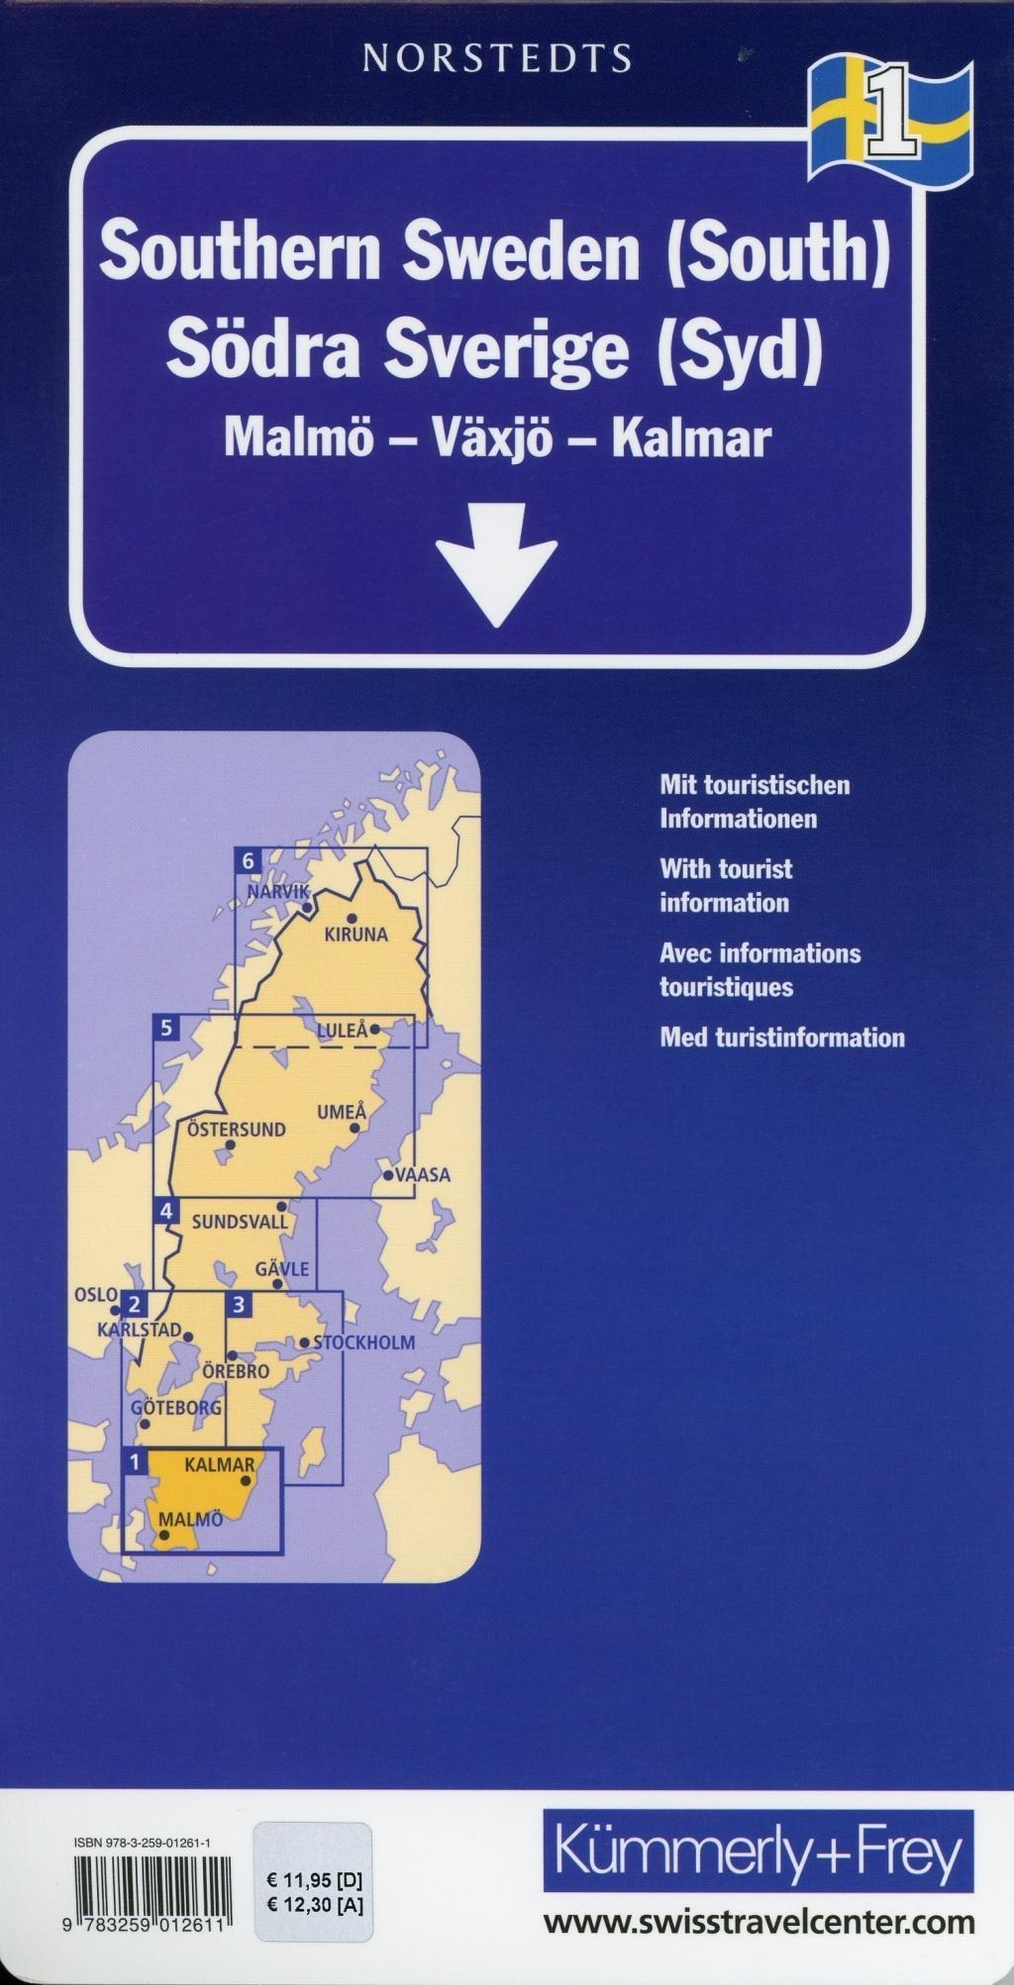 Kummerly Frey Karte Sud Schweden Sud Regionalkarte Suede Du Sud